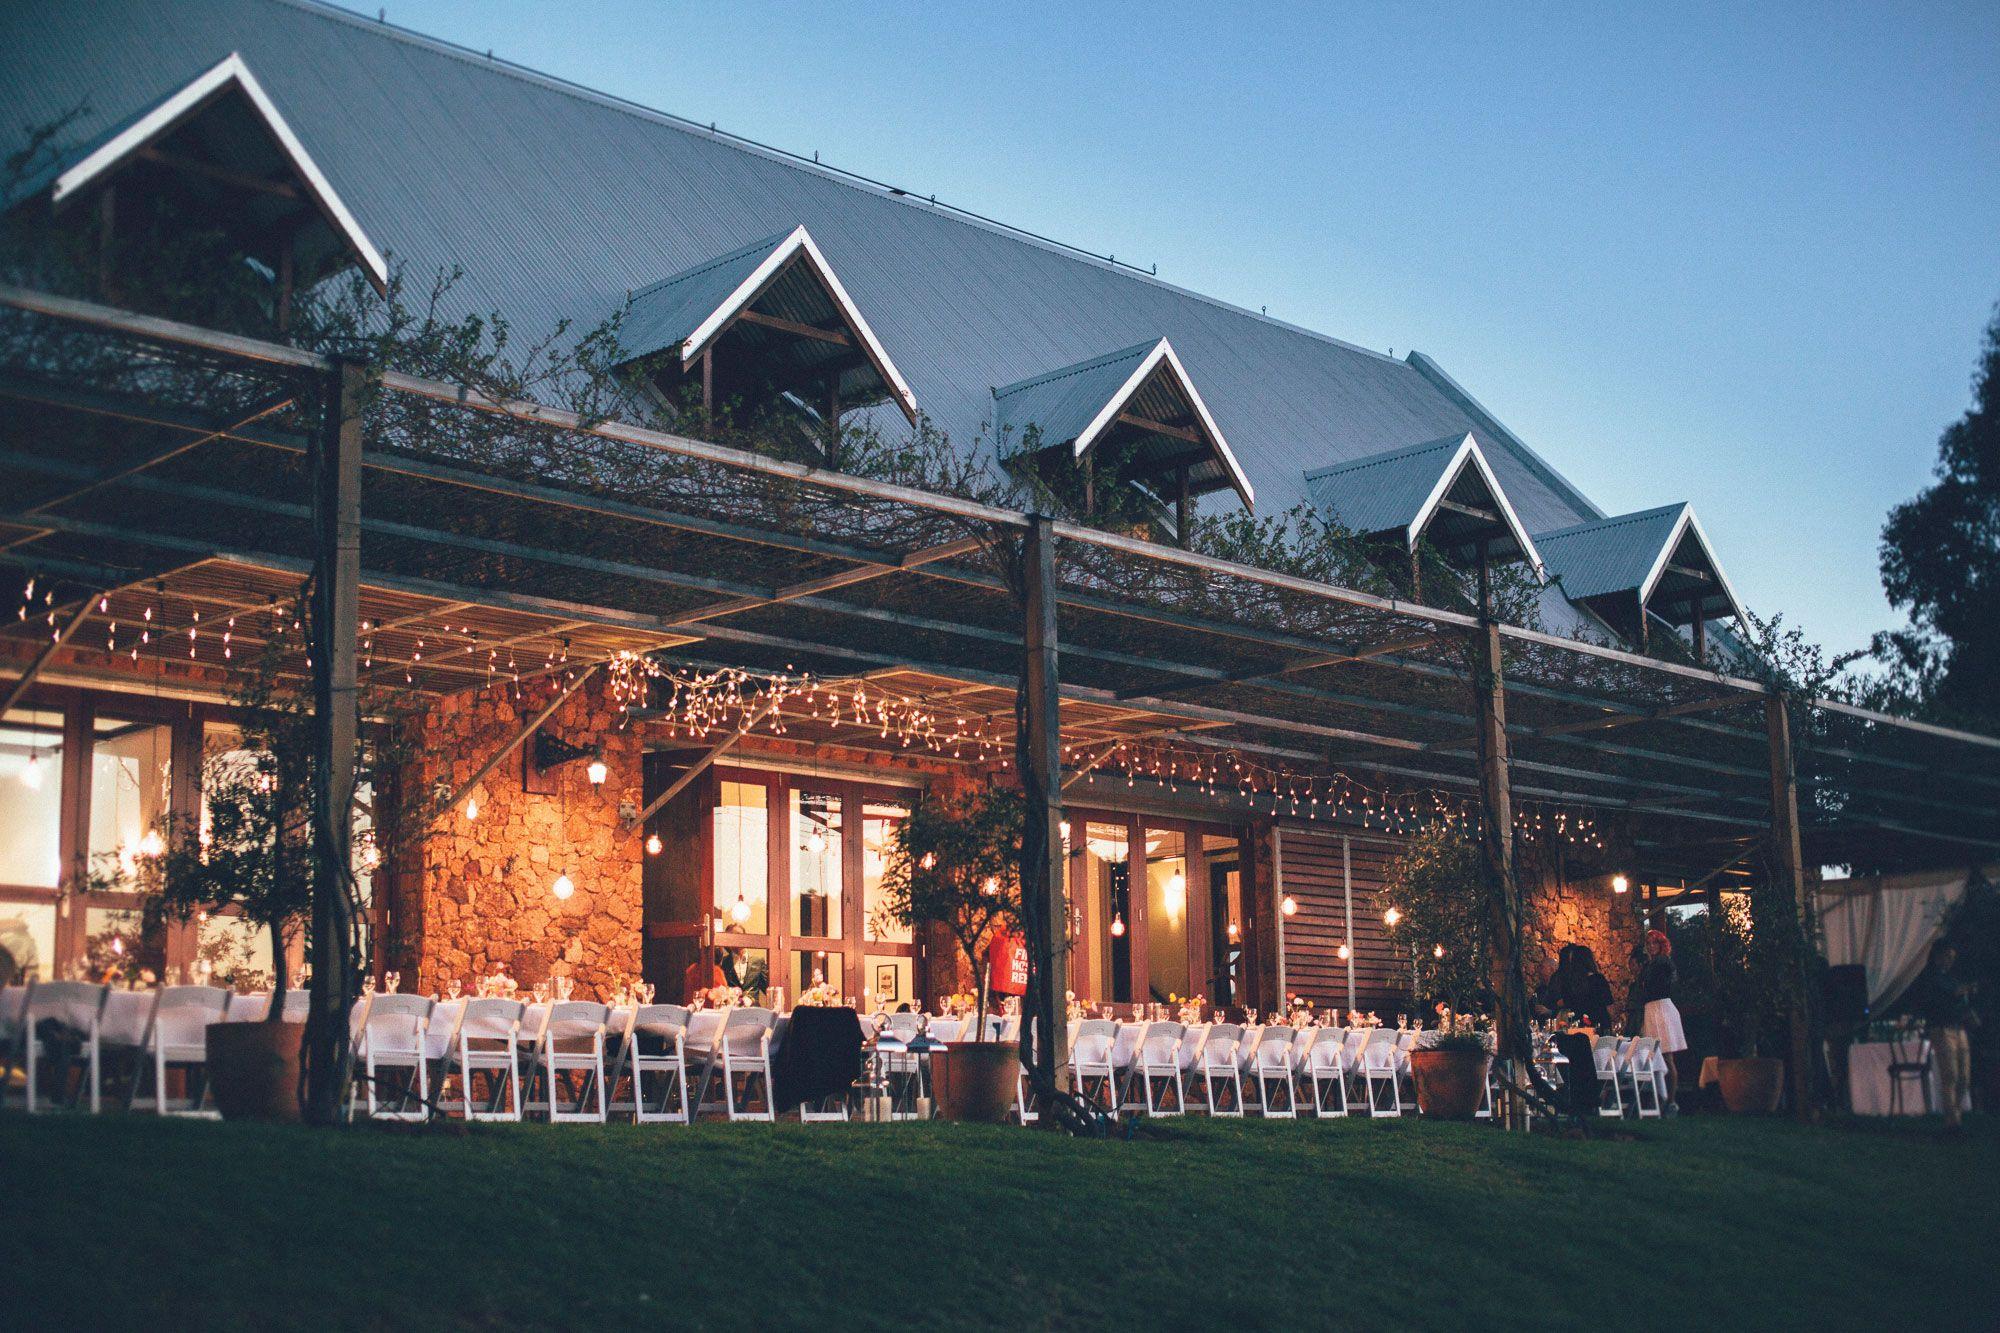 Ceremony Locations Wedding locations australia, Perth